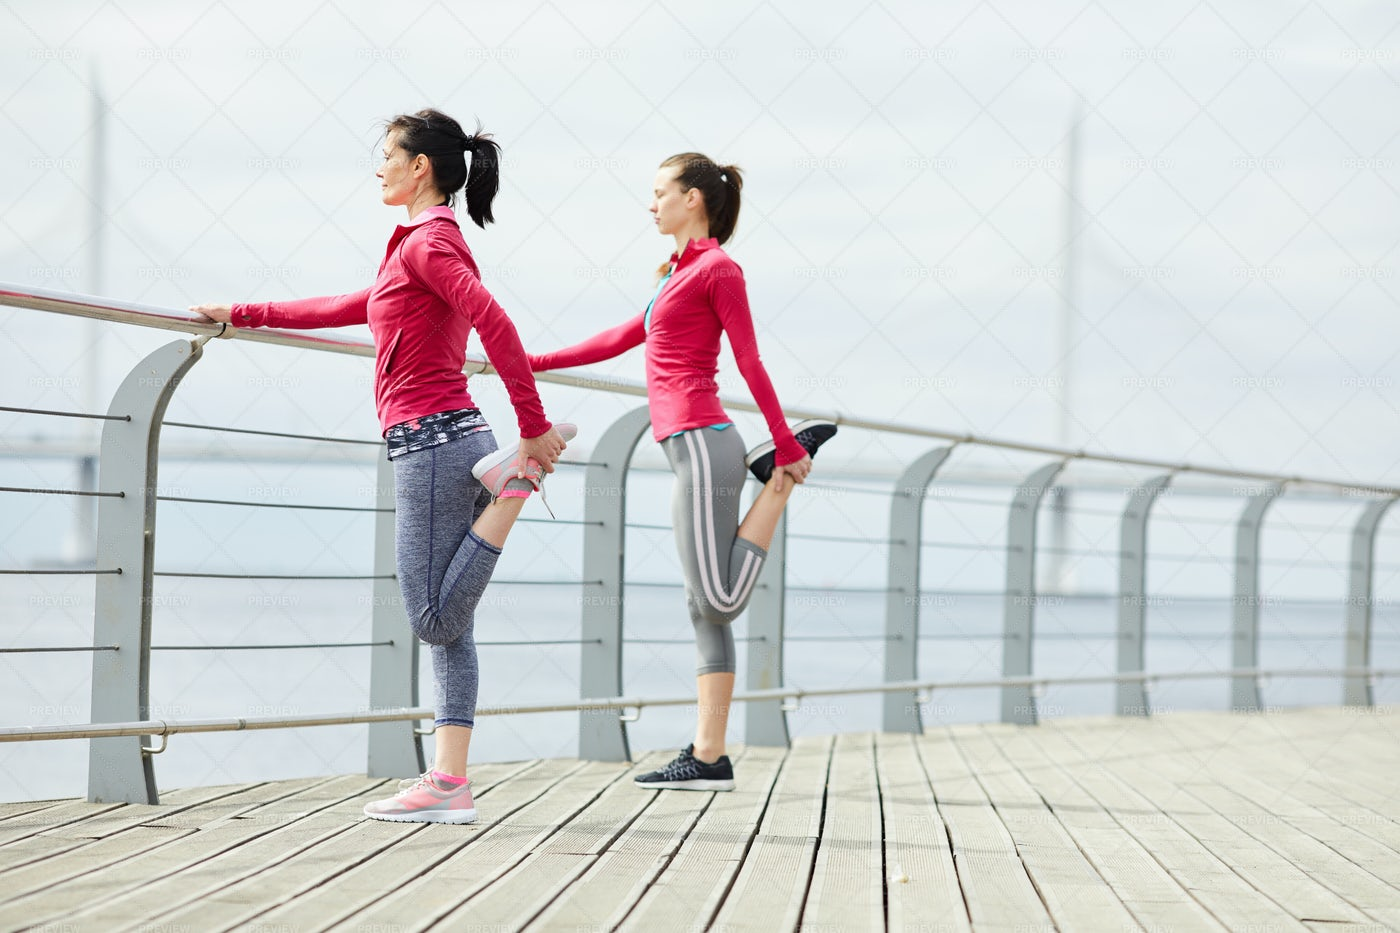 Women Stretching On Pier: Stock Photos